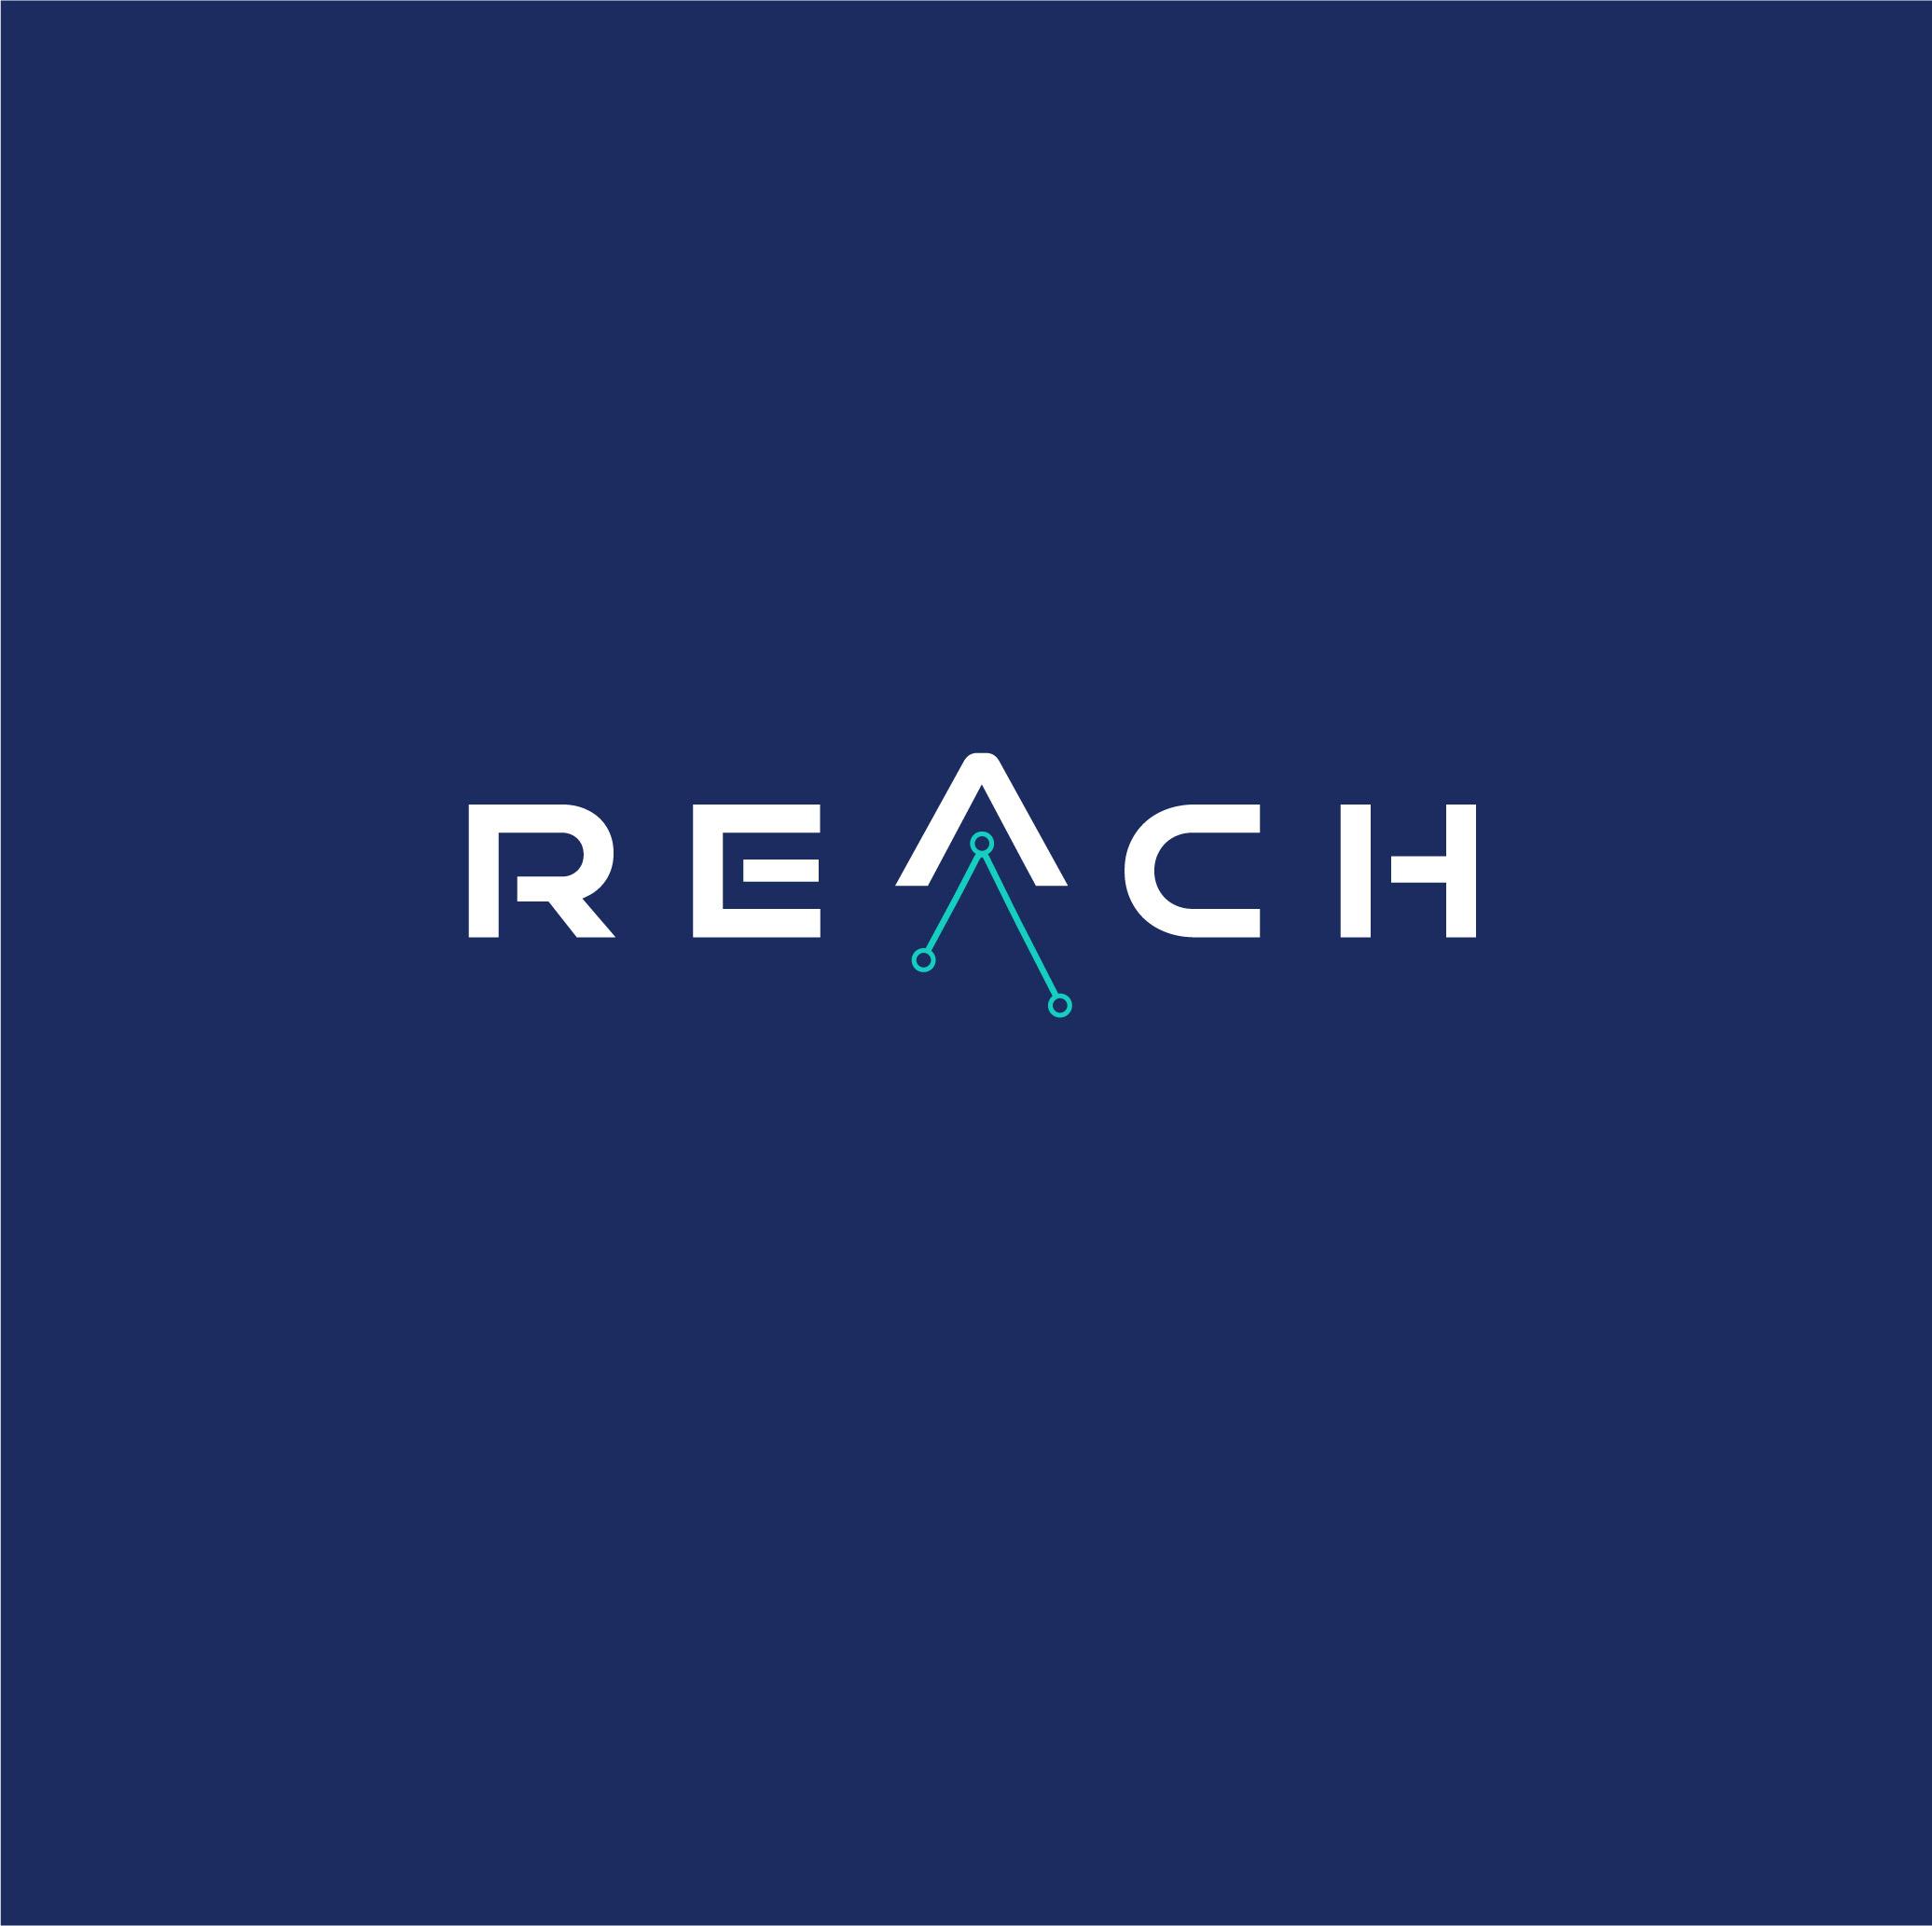 Reach Incubator selects Wenalyze